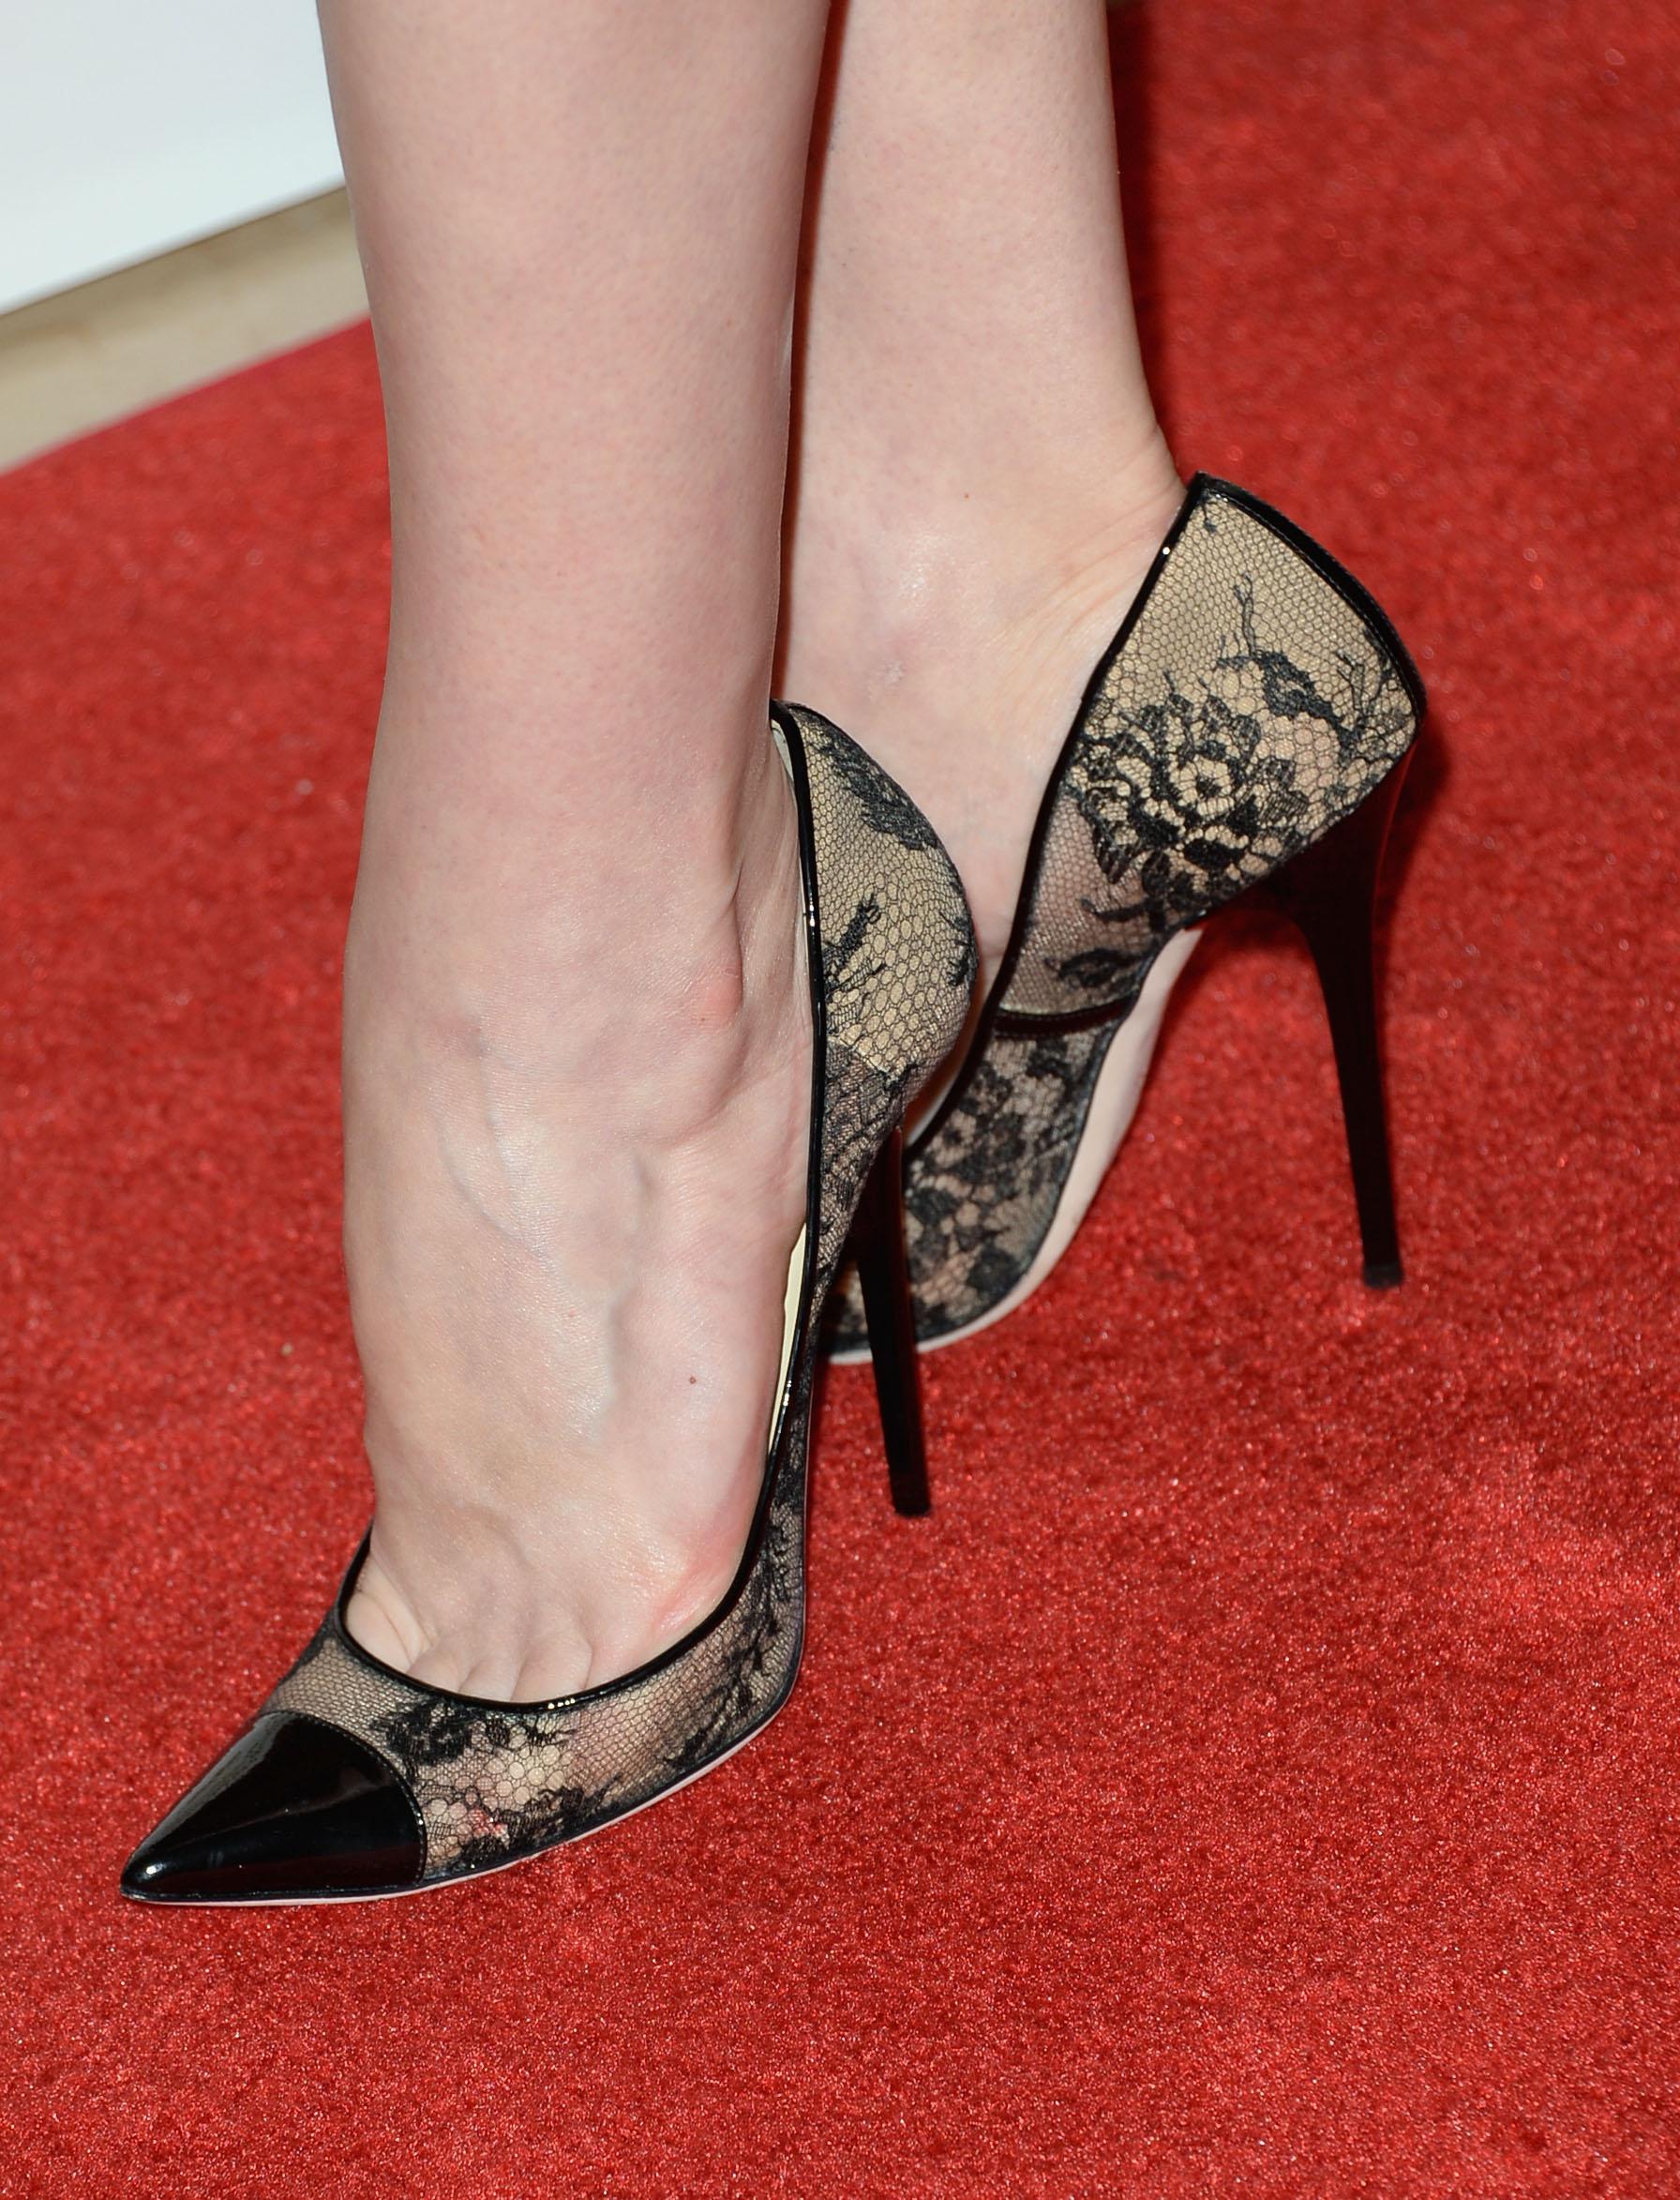 The Toe Cleavage Blog: More TV ladies